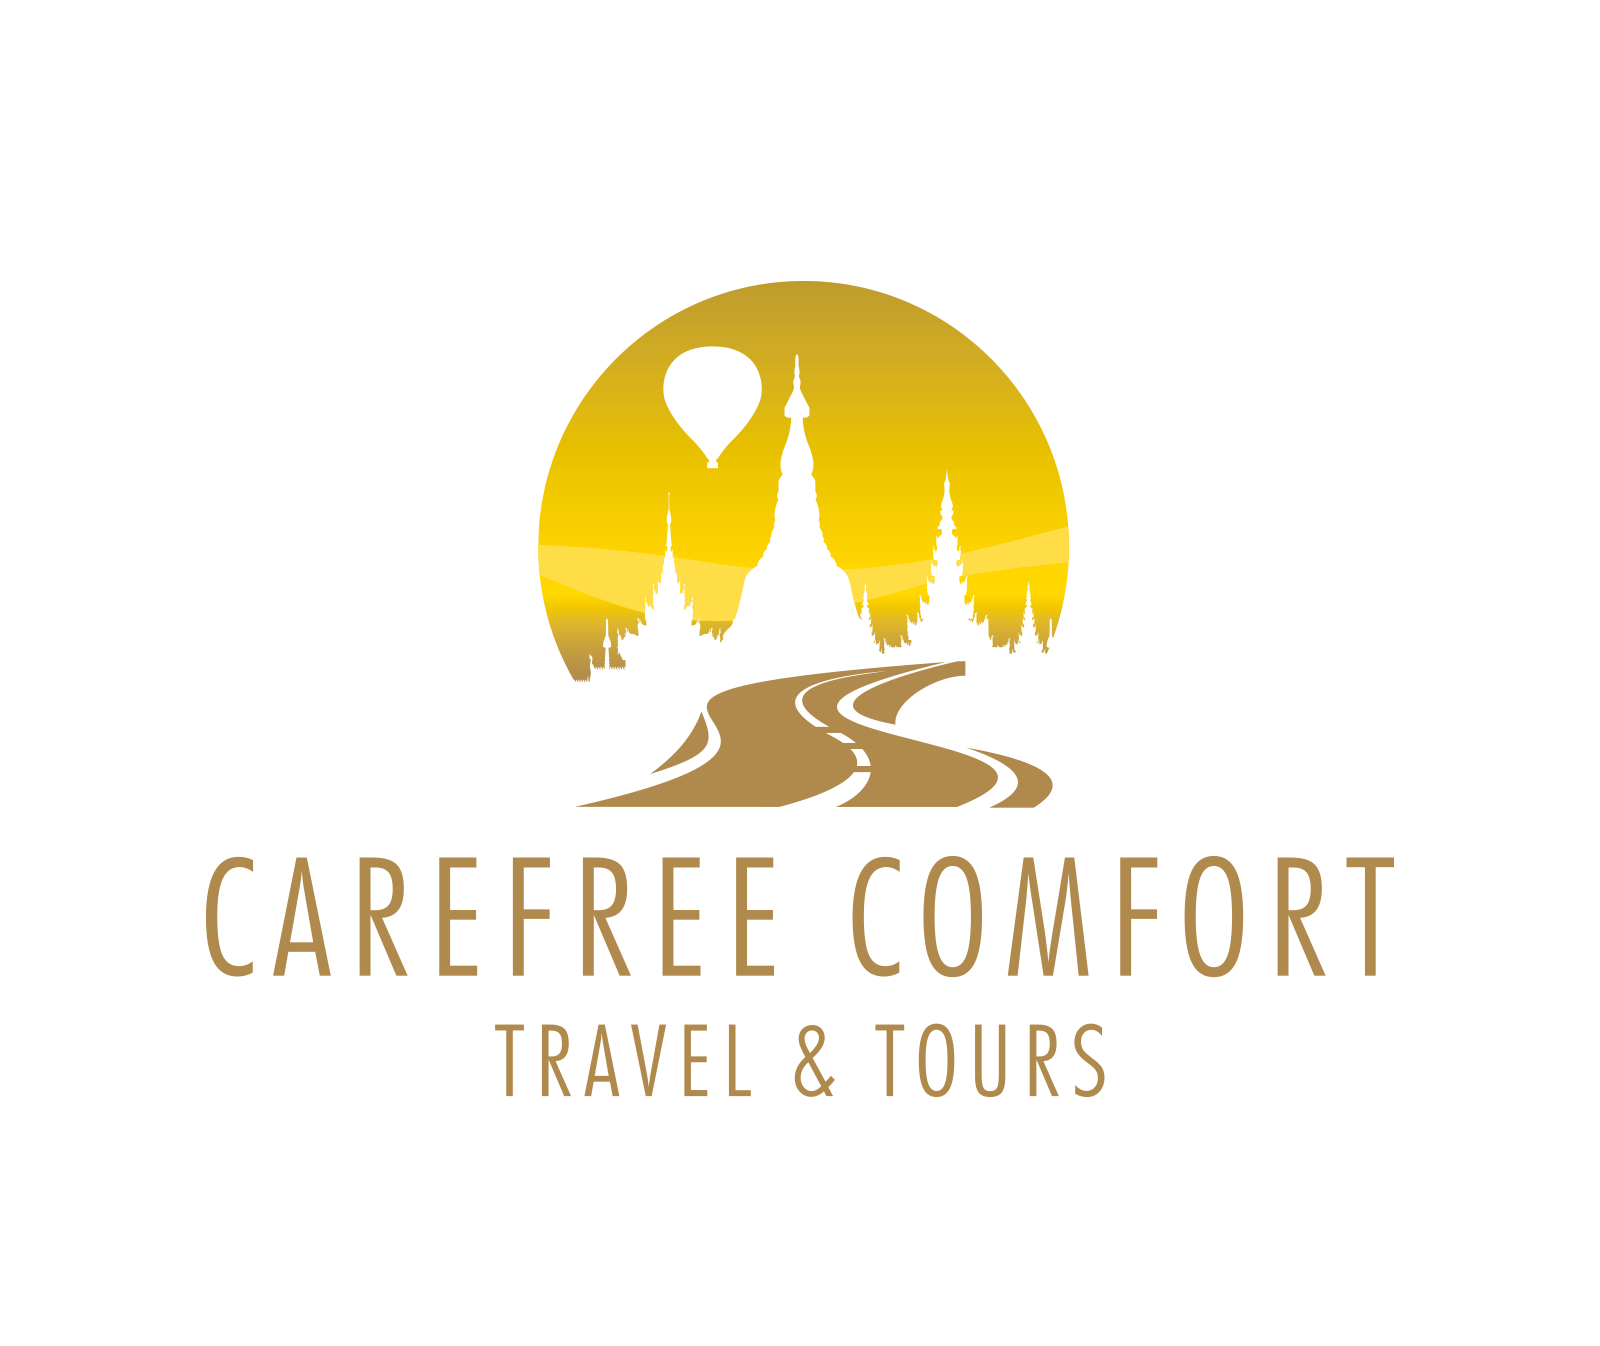 carefree-comfort-logo-coloured.png